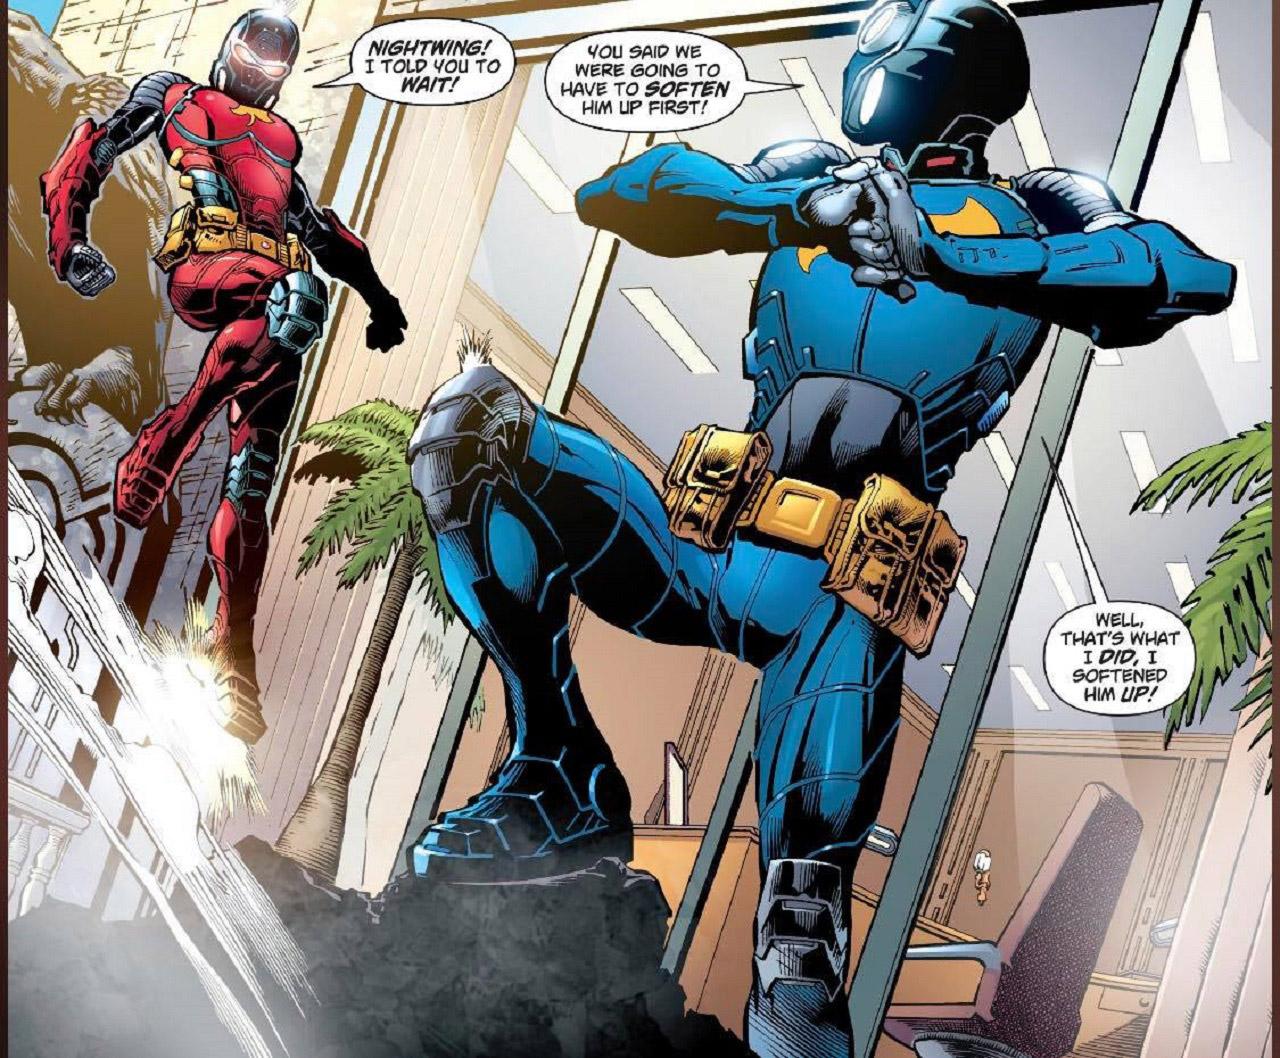 Nightwing-4.jpg